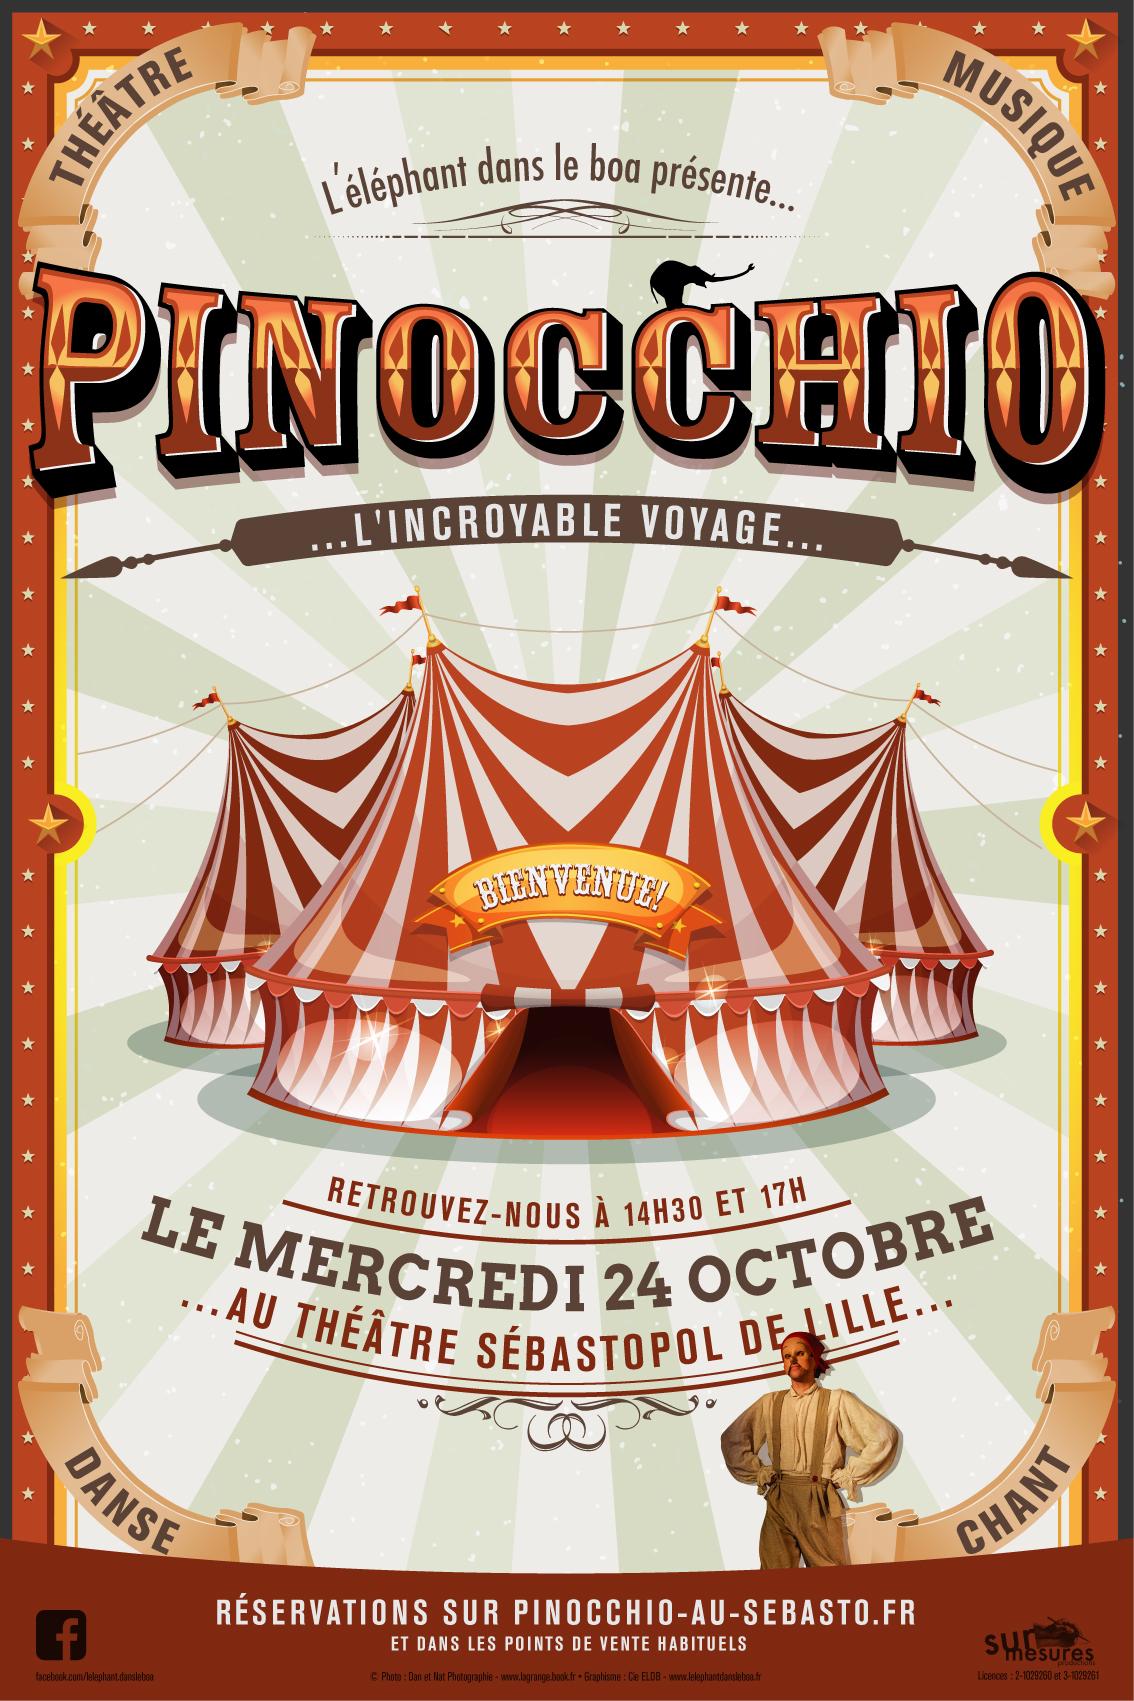 PINOCCHIO : L INCROYABLE VOYAGE